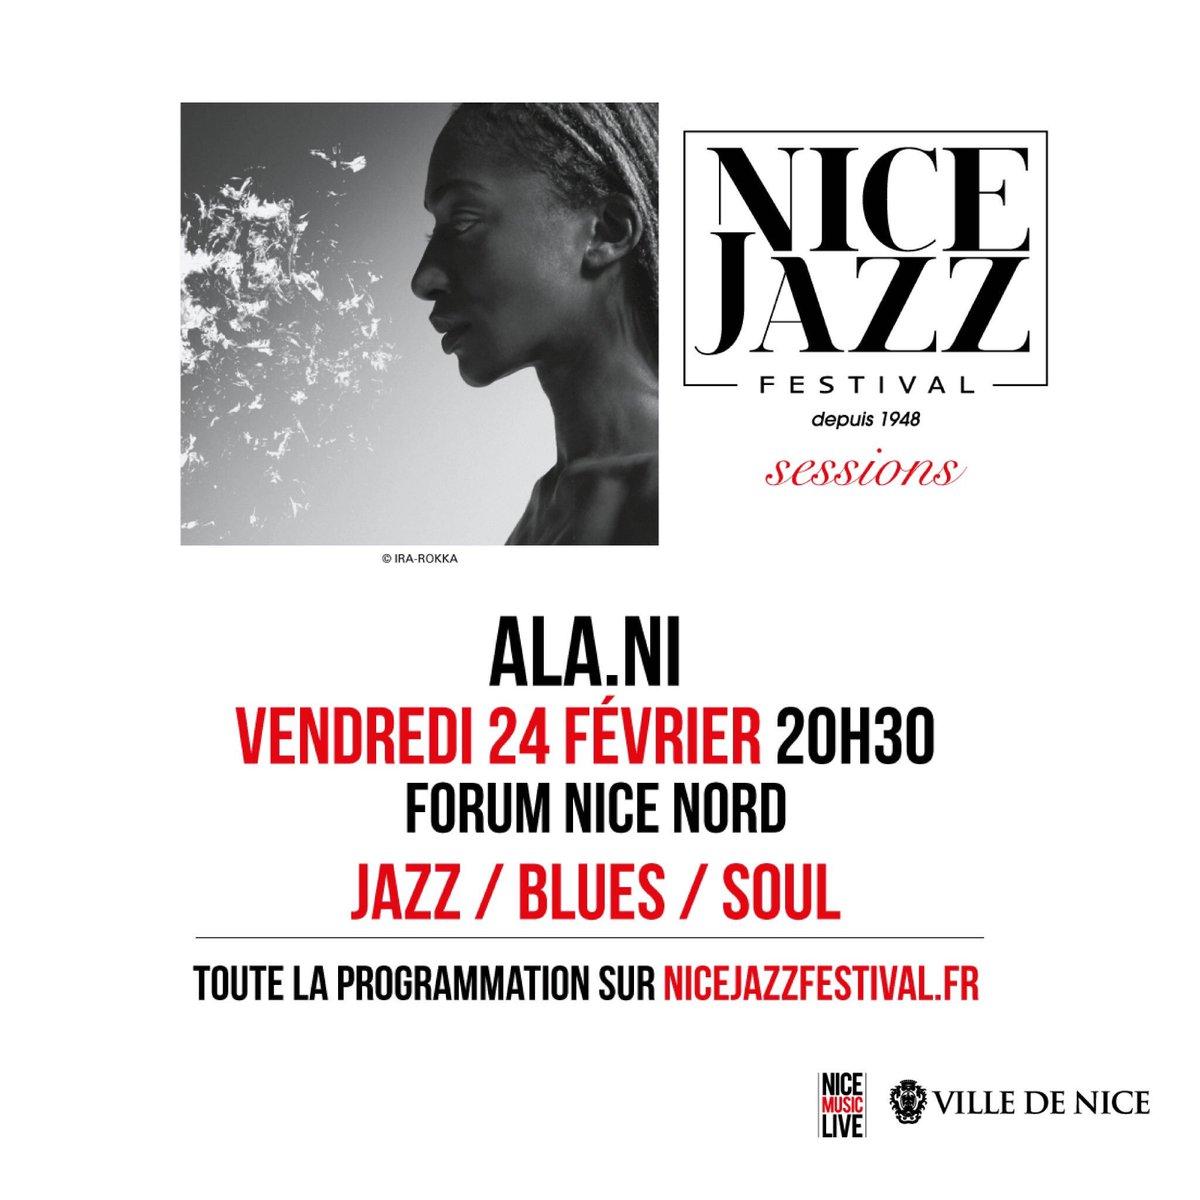 @alaniofficial sera en concert demain vendredi 24 février @VilledeNice dans le cadre des @nicejazzfest #sessions RDV au #forumnicenord<br>http://pic.twitter.com/pg8rjG5Dy8